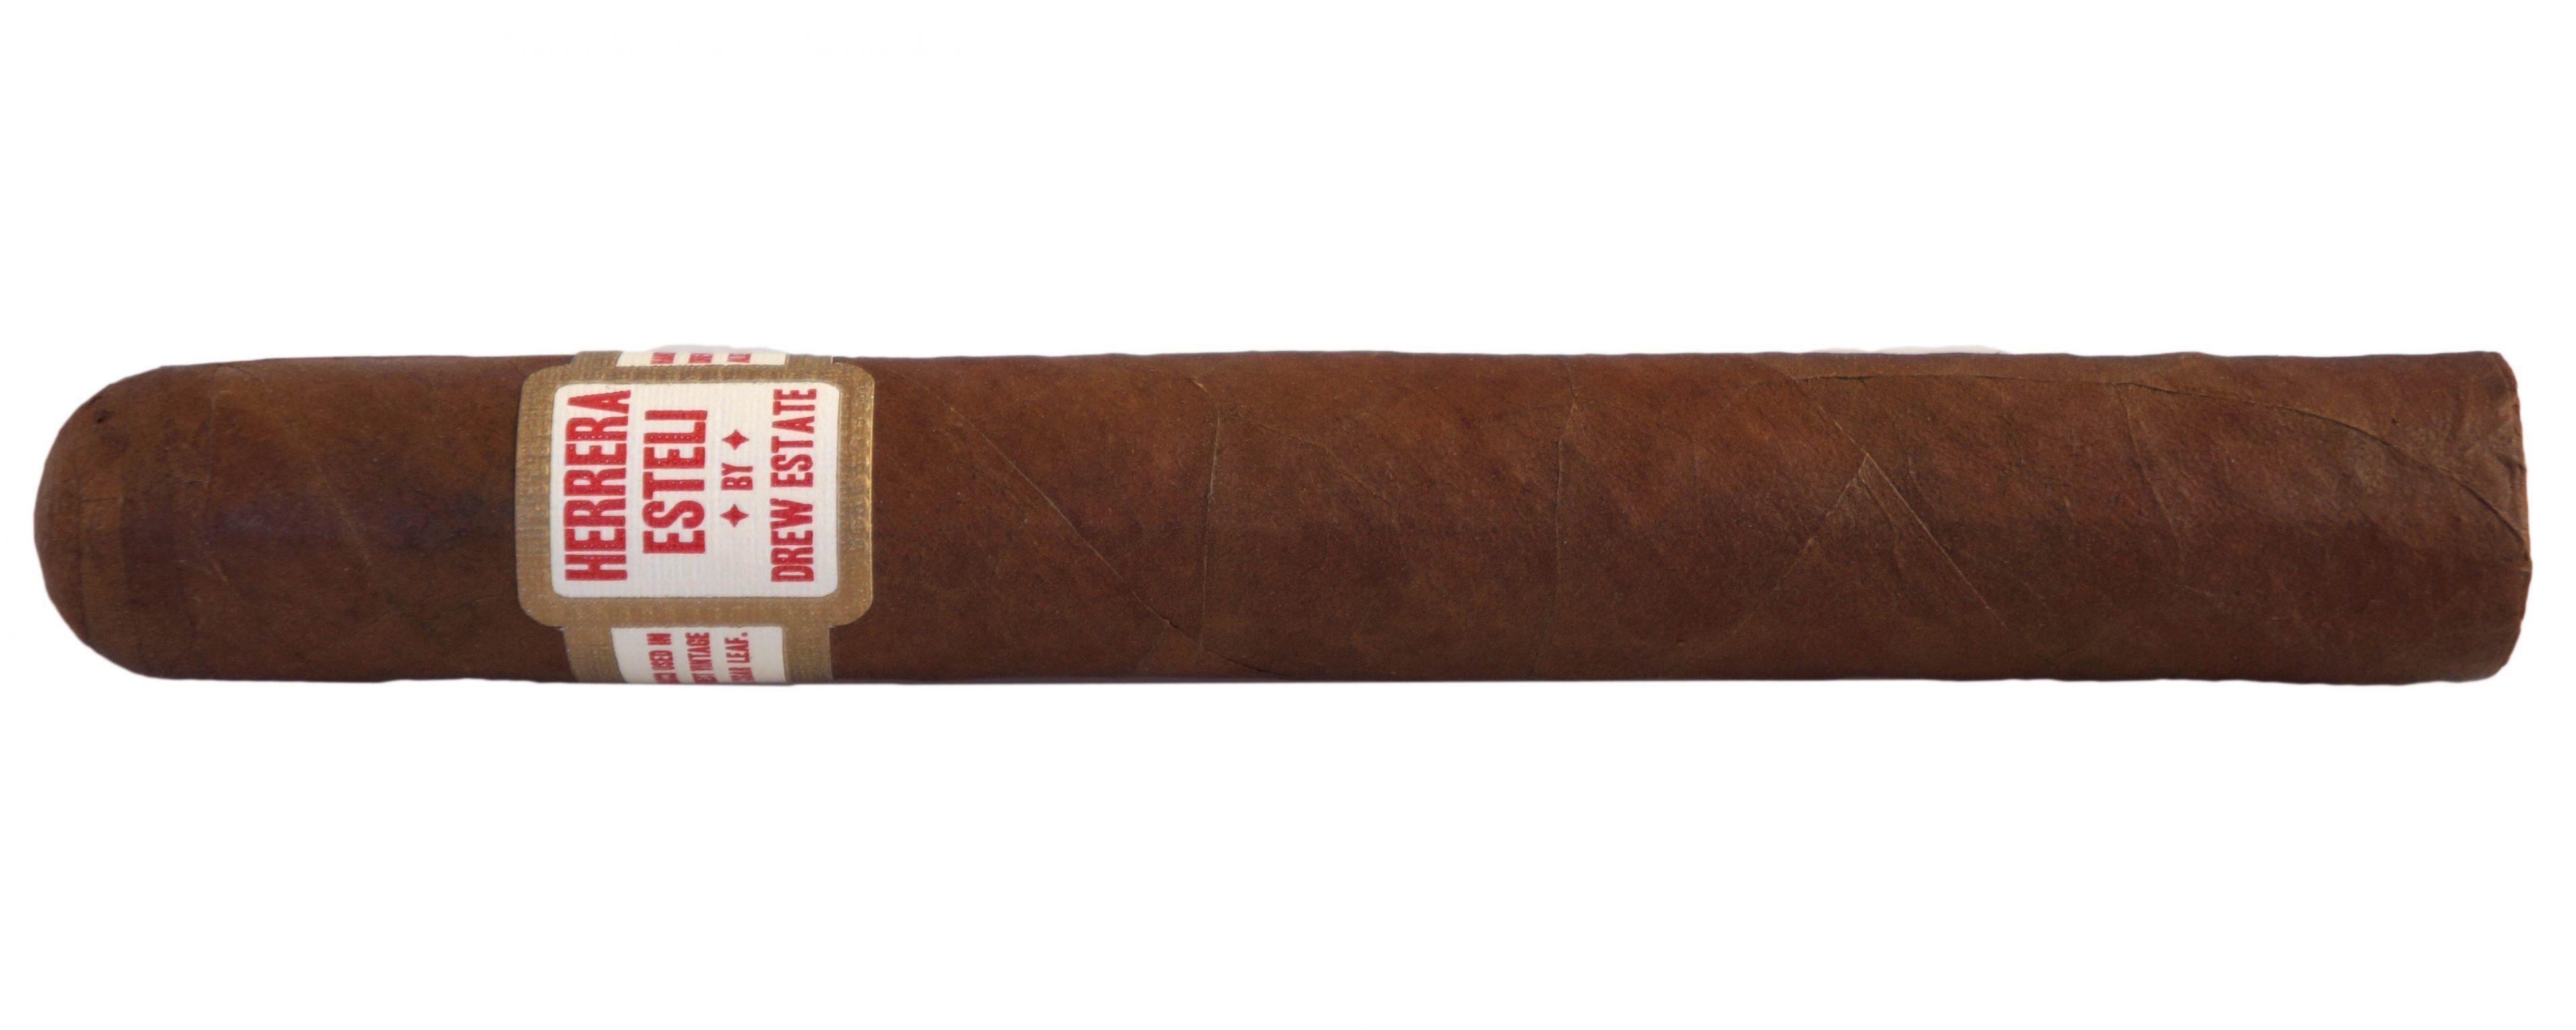 Blind Cigar Review: Herrera Esteli | Toro Especial Tubo